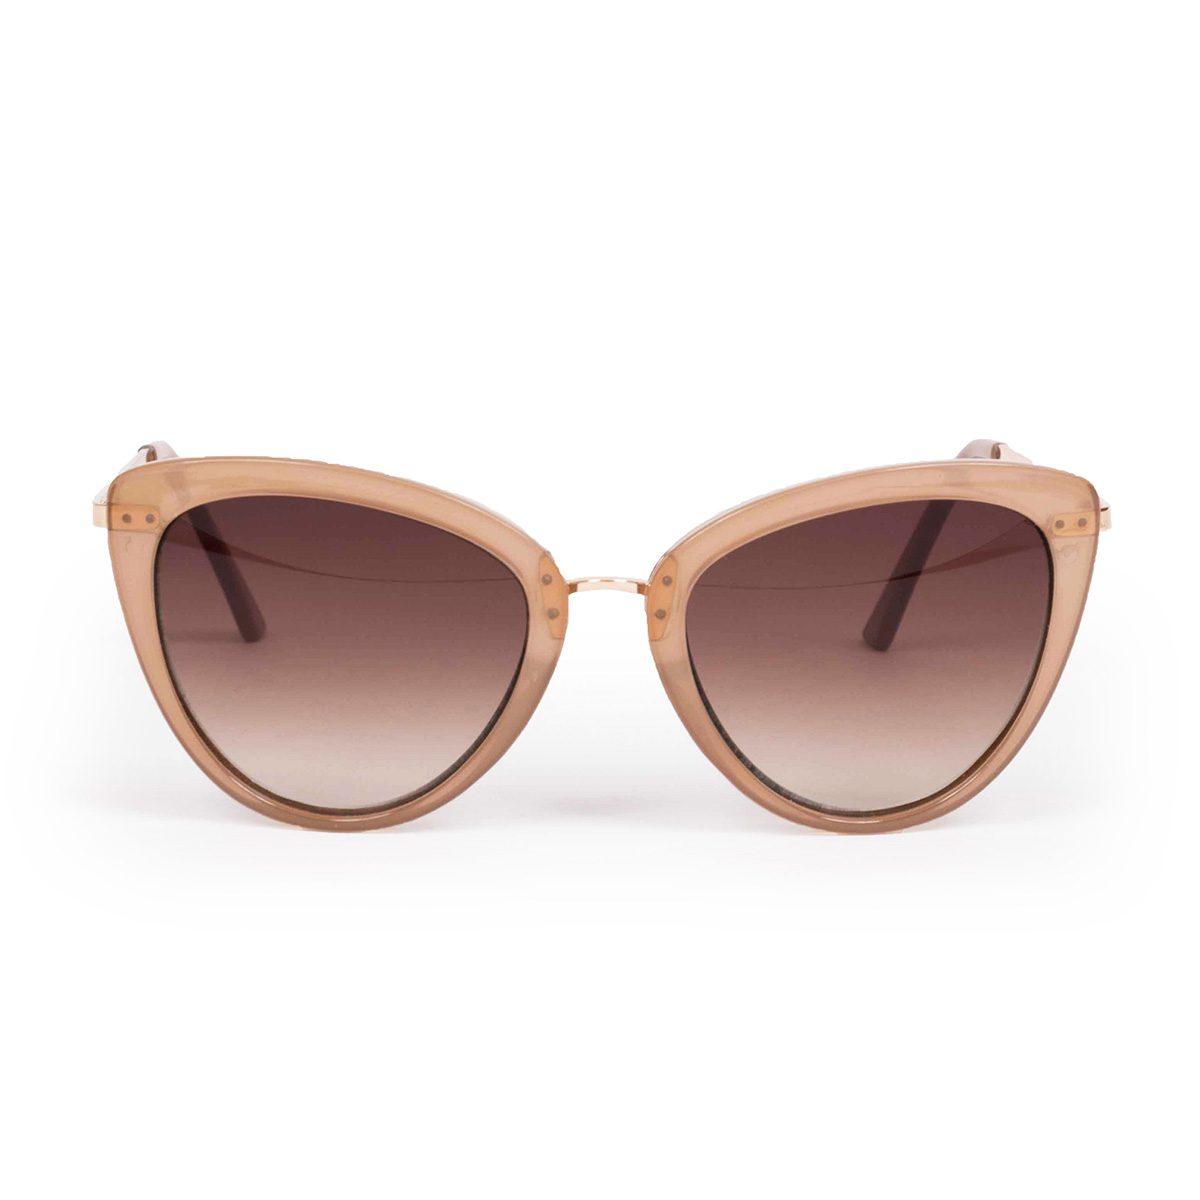 Nude Sunglasses